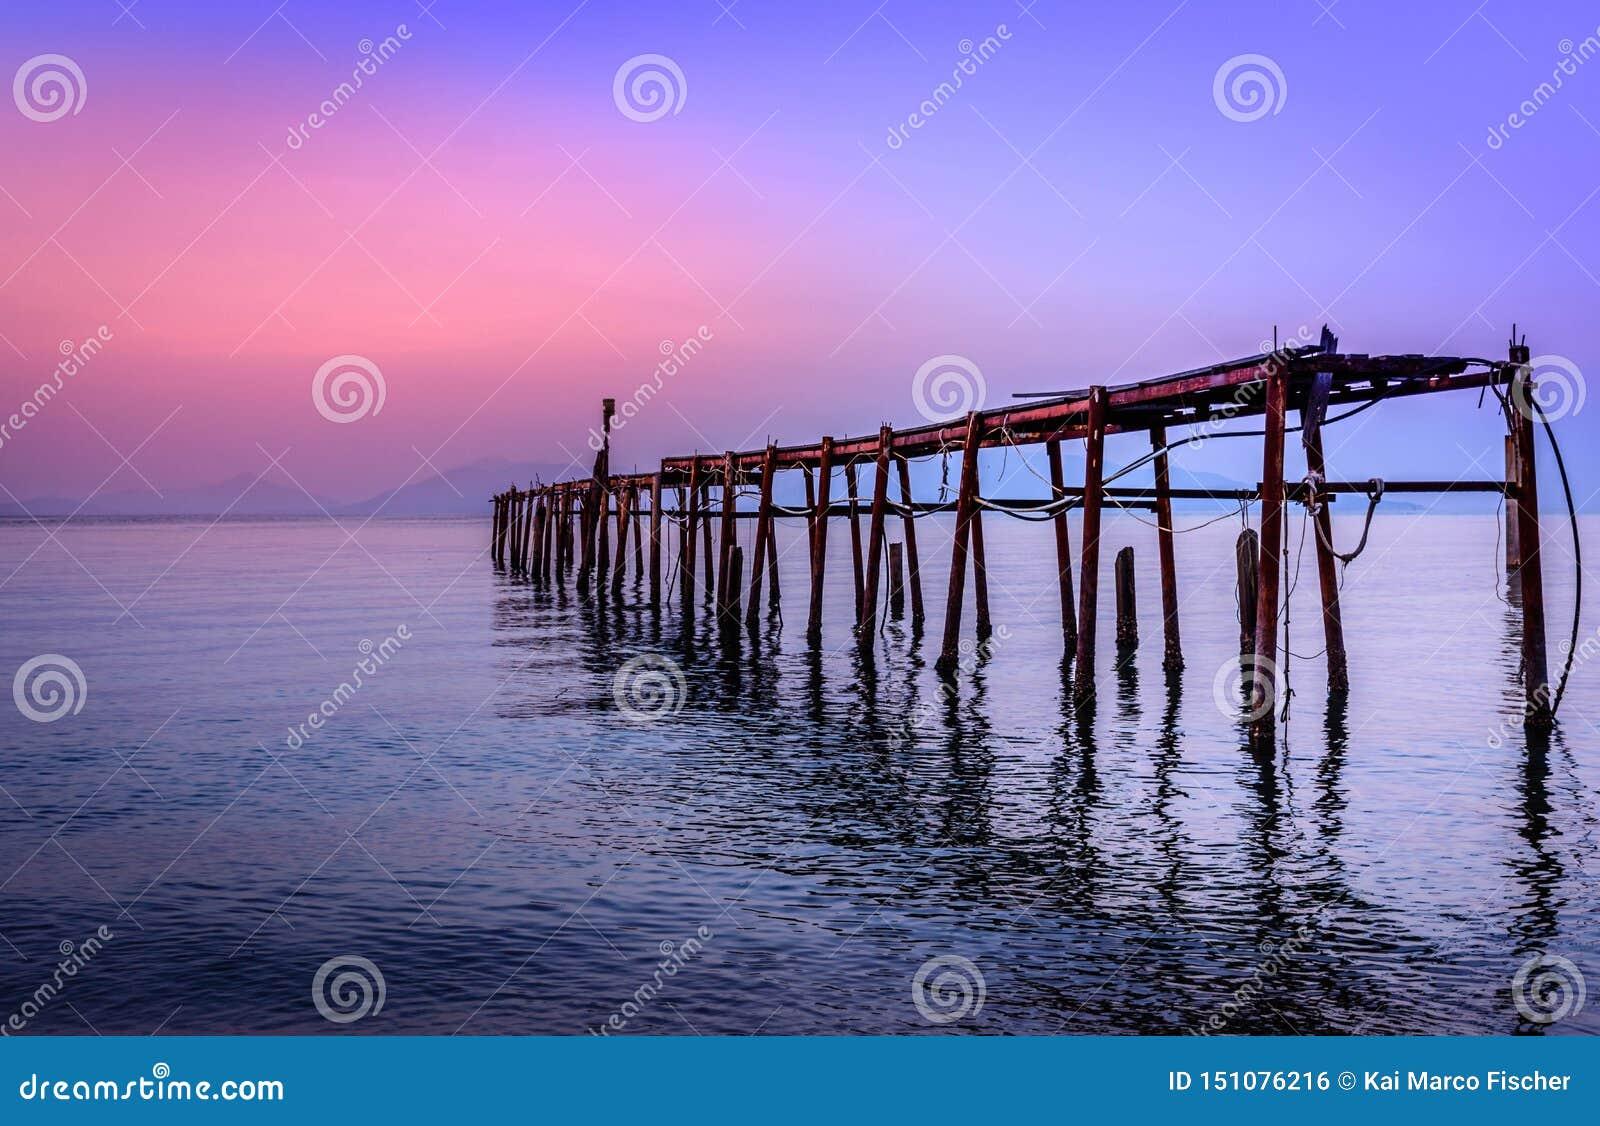 Sunset at the Sea, Koh Samui / Thailand